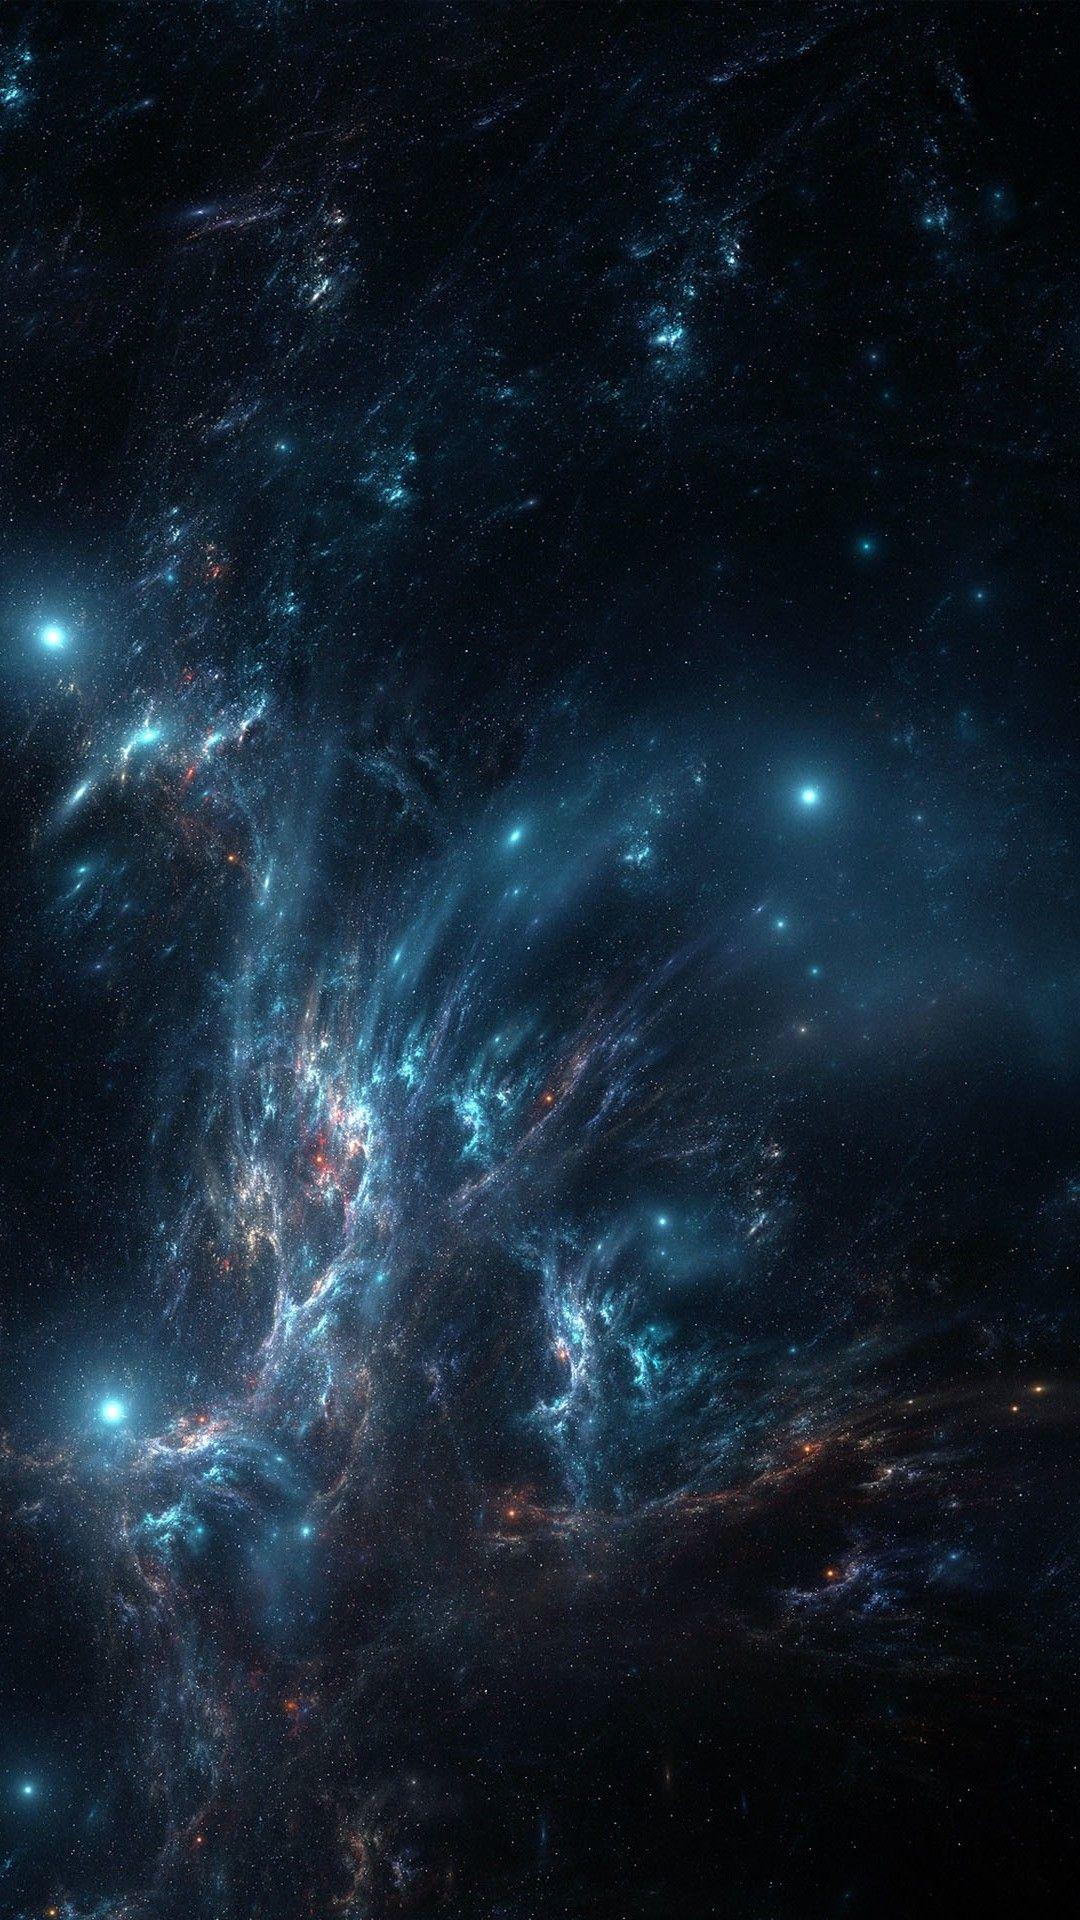 Galaxy Wallpaper Iphone 7 Plus Space Galaxy wallpaper Galaxy 1080x1920